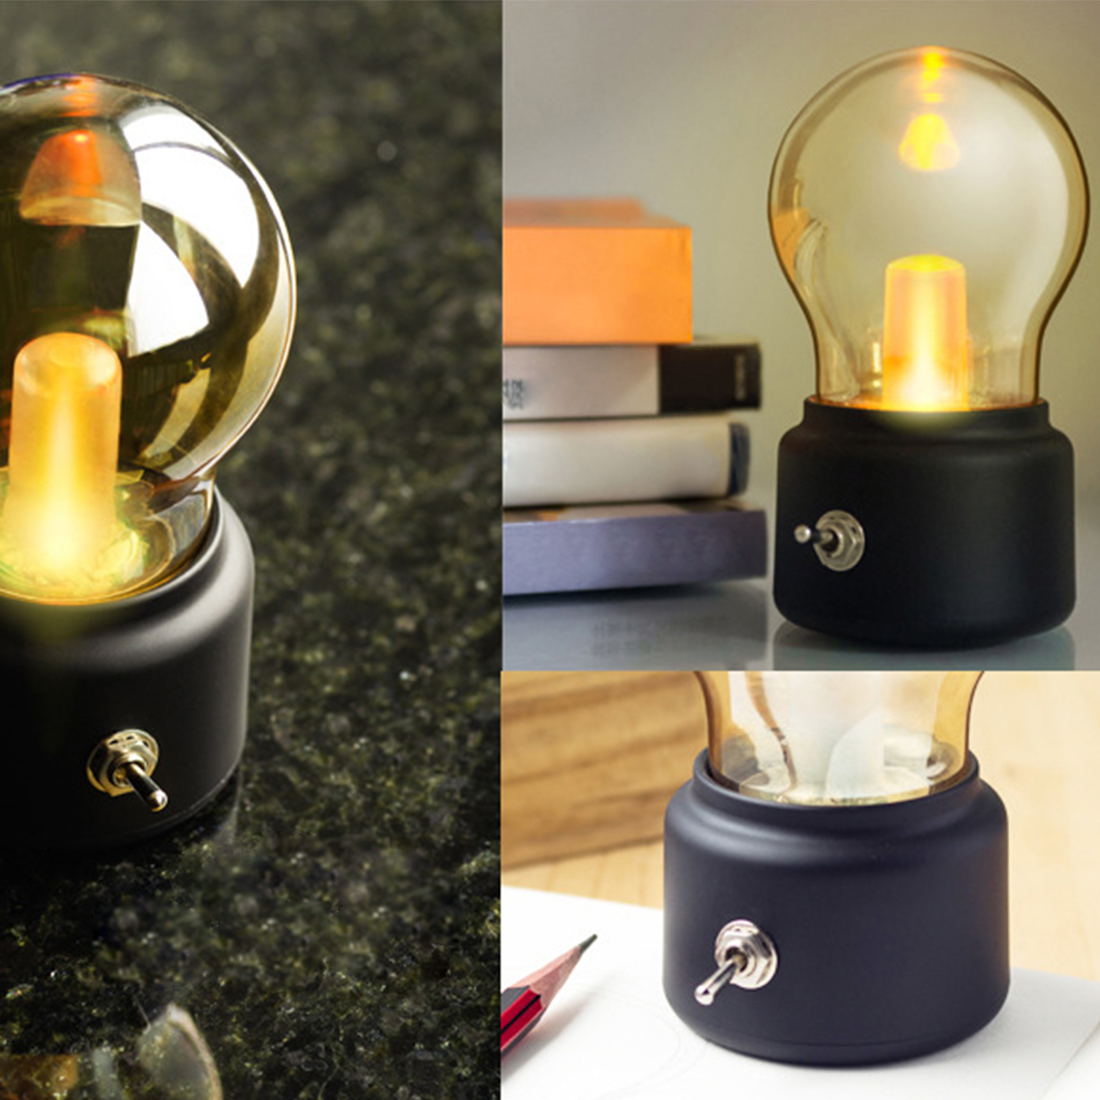 Vintage Bulb Night Light Retro USB Lamp Rechargeable Luminaria Nightlight LED Energy-saving Book Lights Mini Bed Lamps